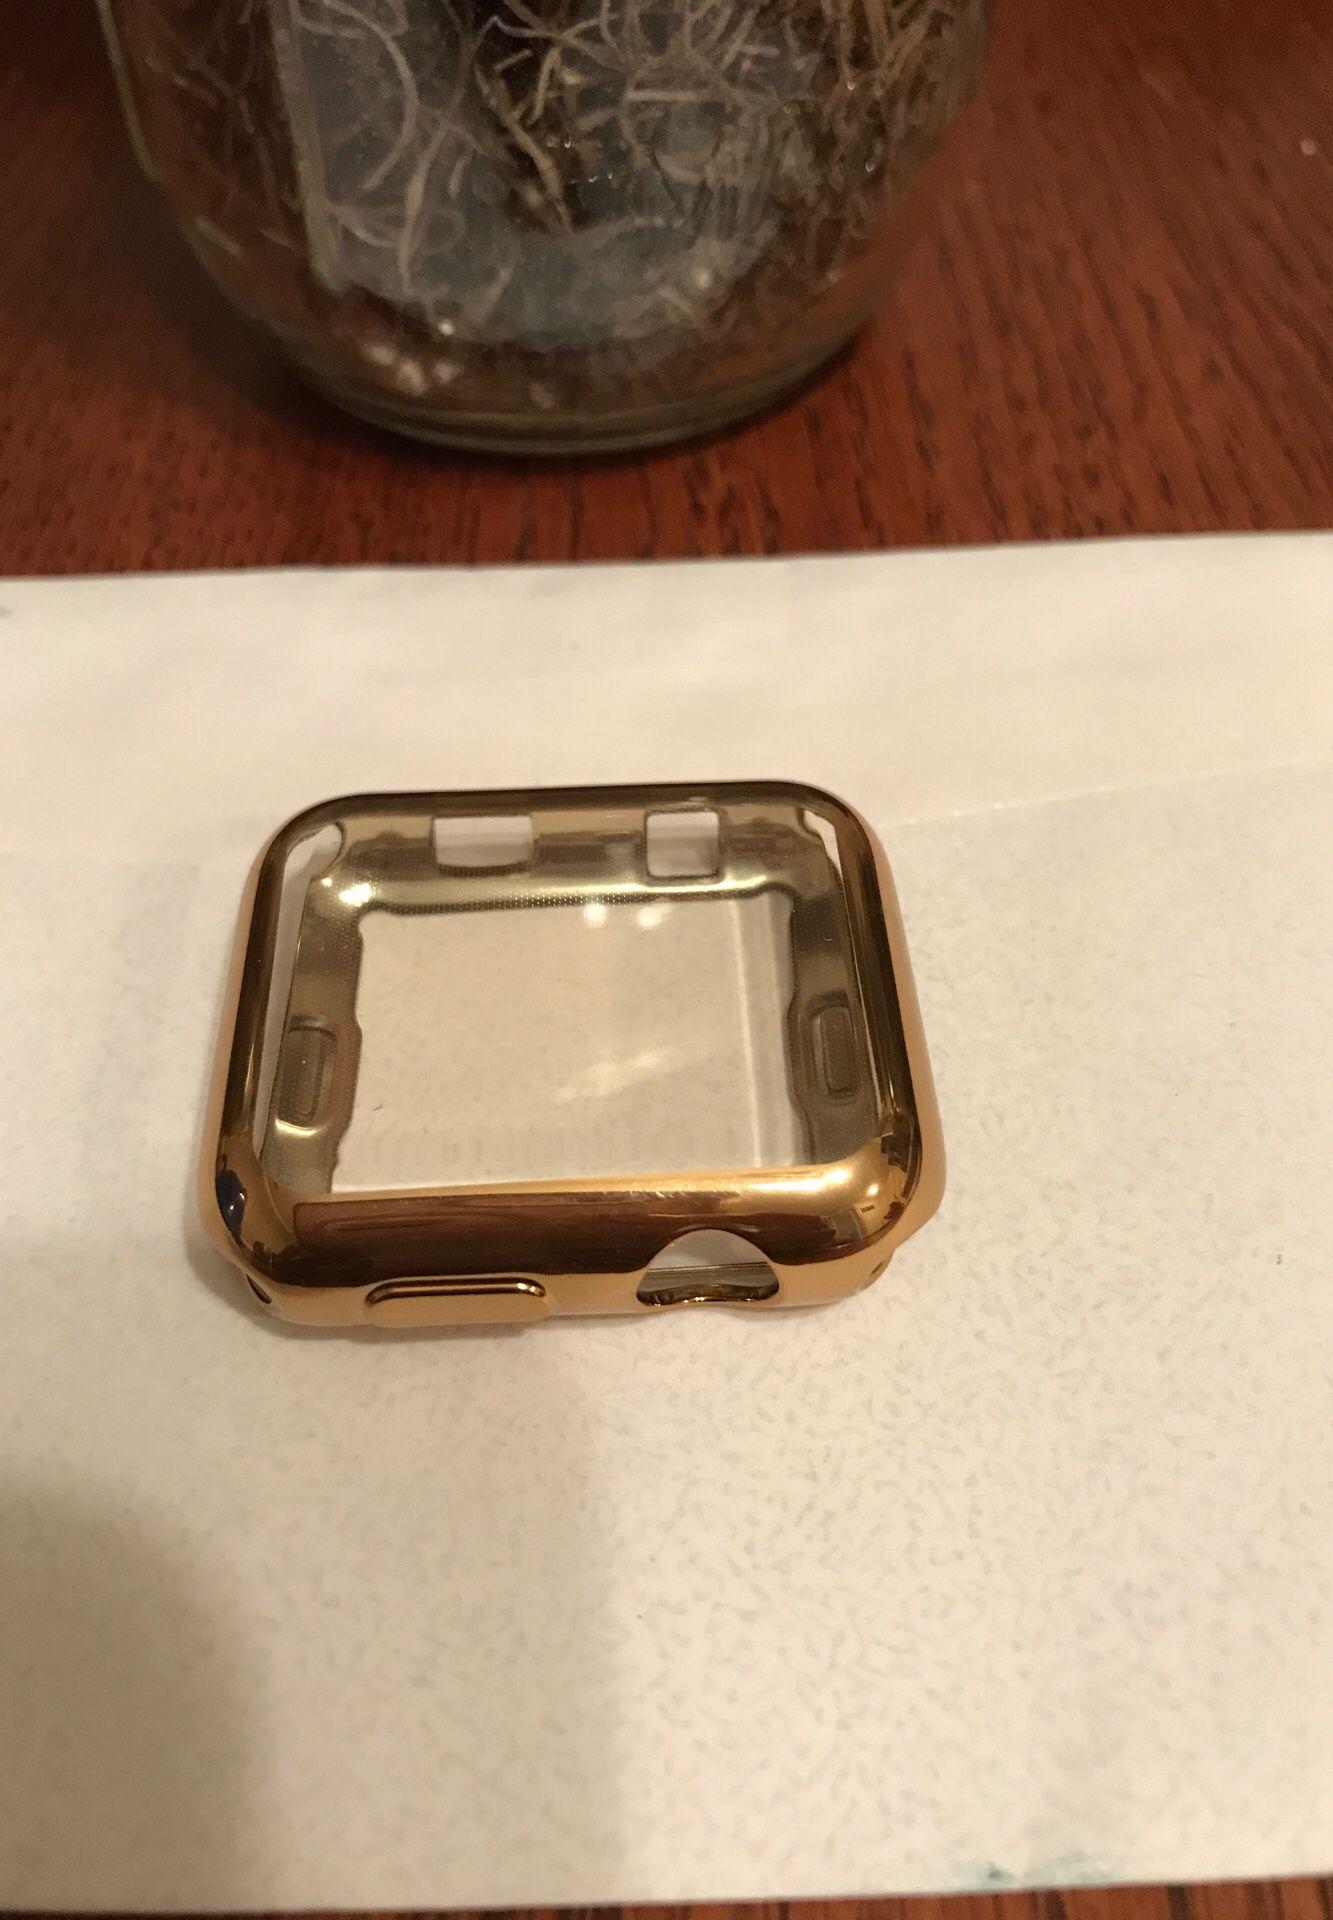 Apple Watch series 2 case